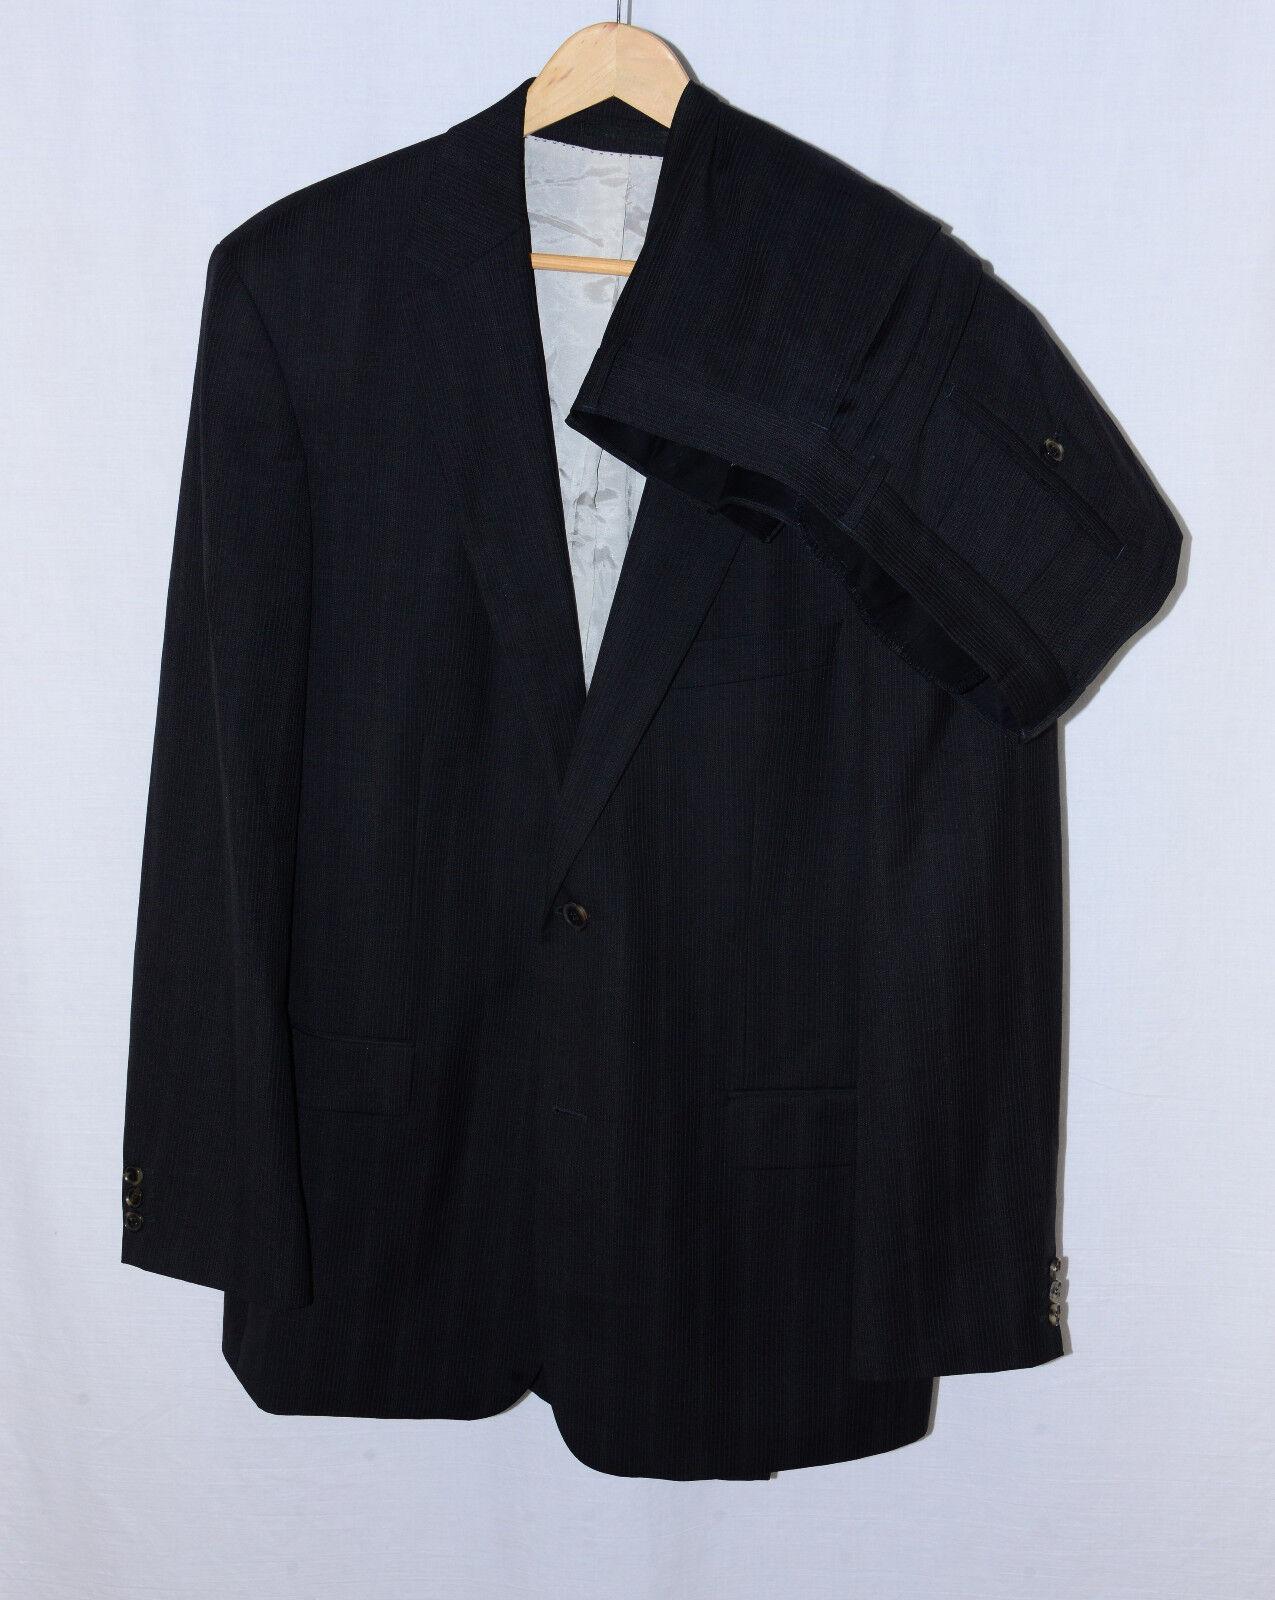 HUGO BOSS charcoal pinstripe Bertolucci   Movie 2 button suit 44, 35 pants